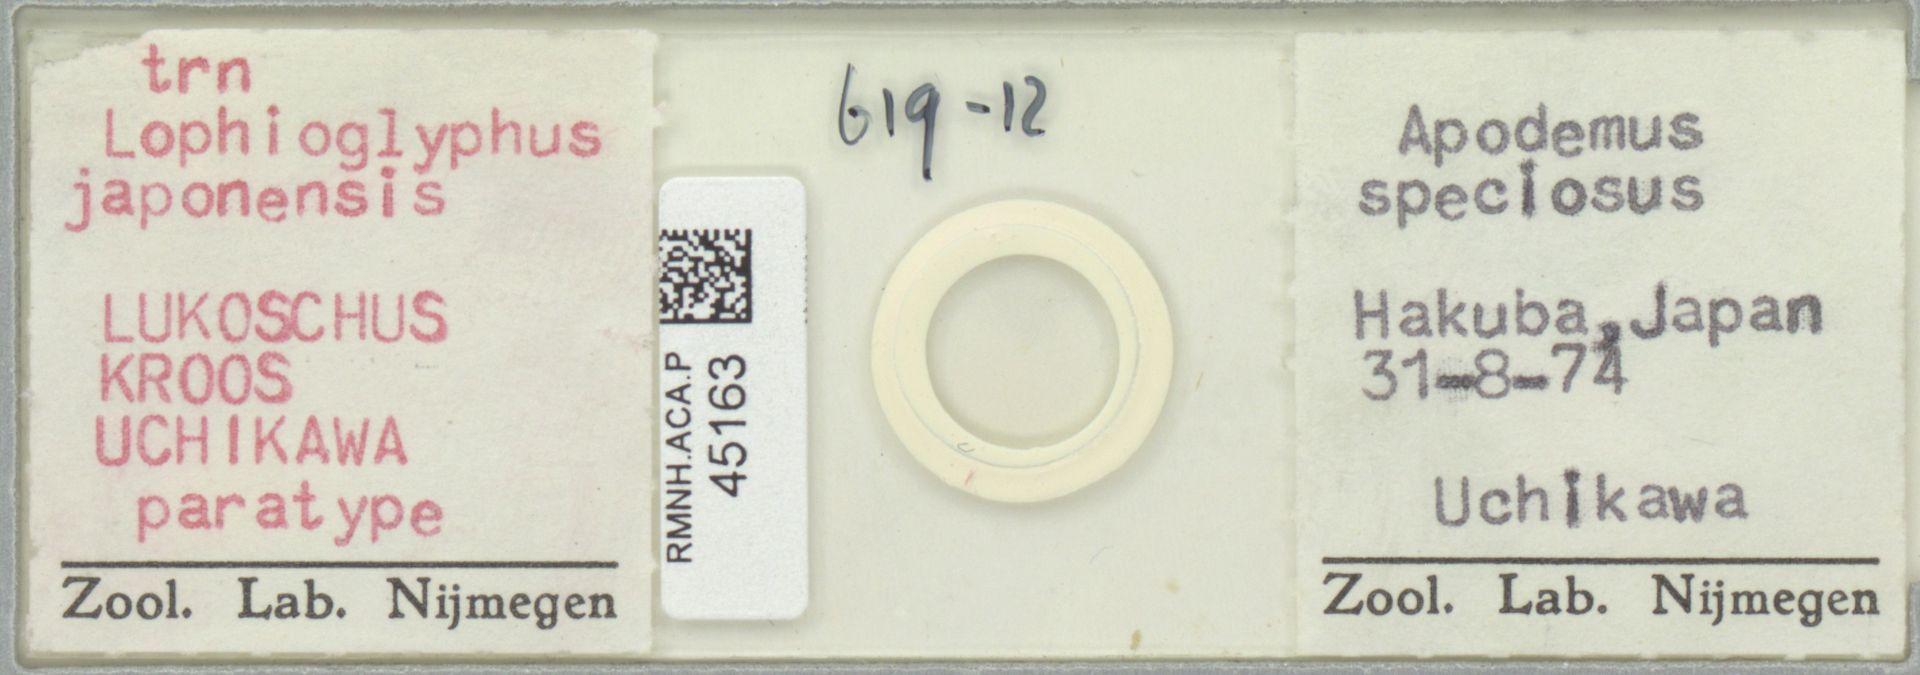 RMNH.ACA.P.45163 | Lophioglyphus japonensis Lukoschus Kroos Uchikawa